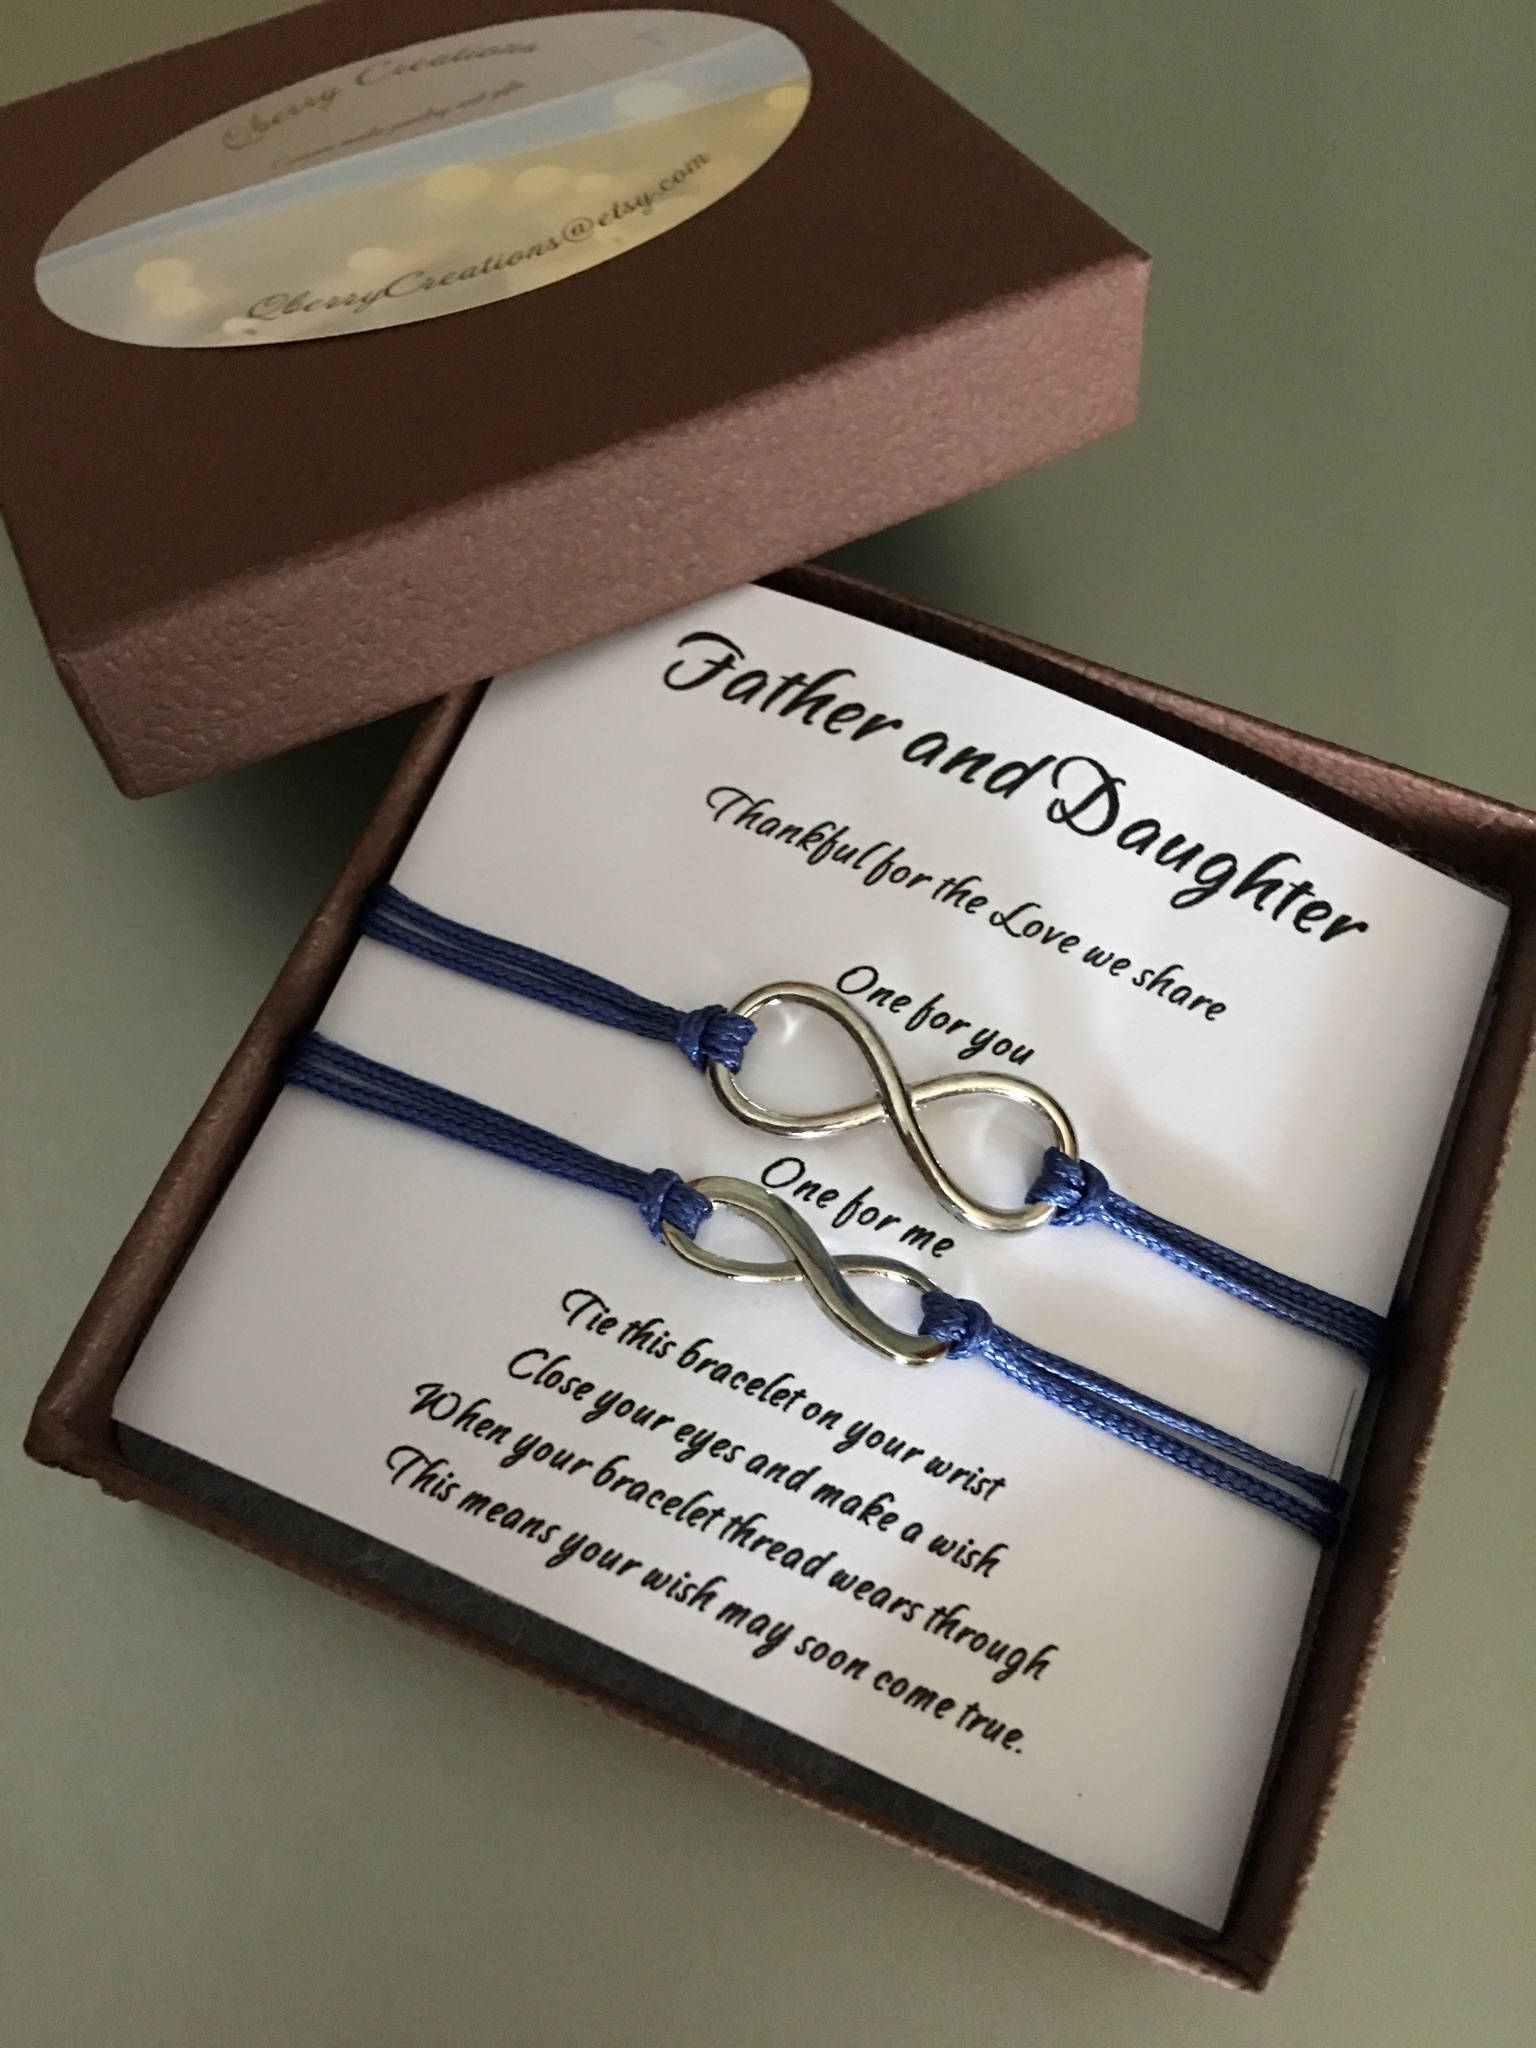 friendship bracelets personalize bracelet custom bracelets father daughter gift long distance gift romantic gift gray white bracelet